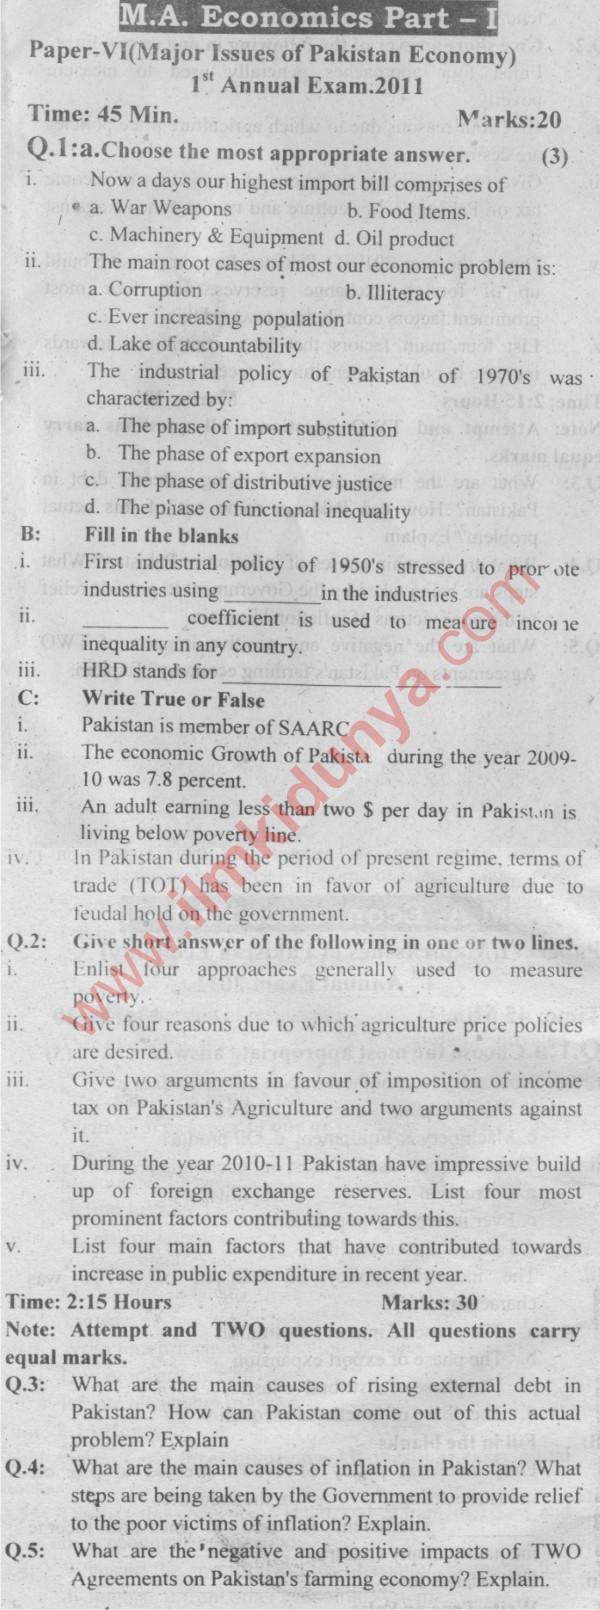 Past Papers 2011 Sargodha University MA Economics Part 1